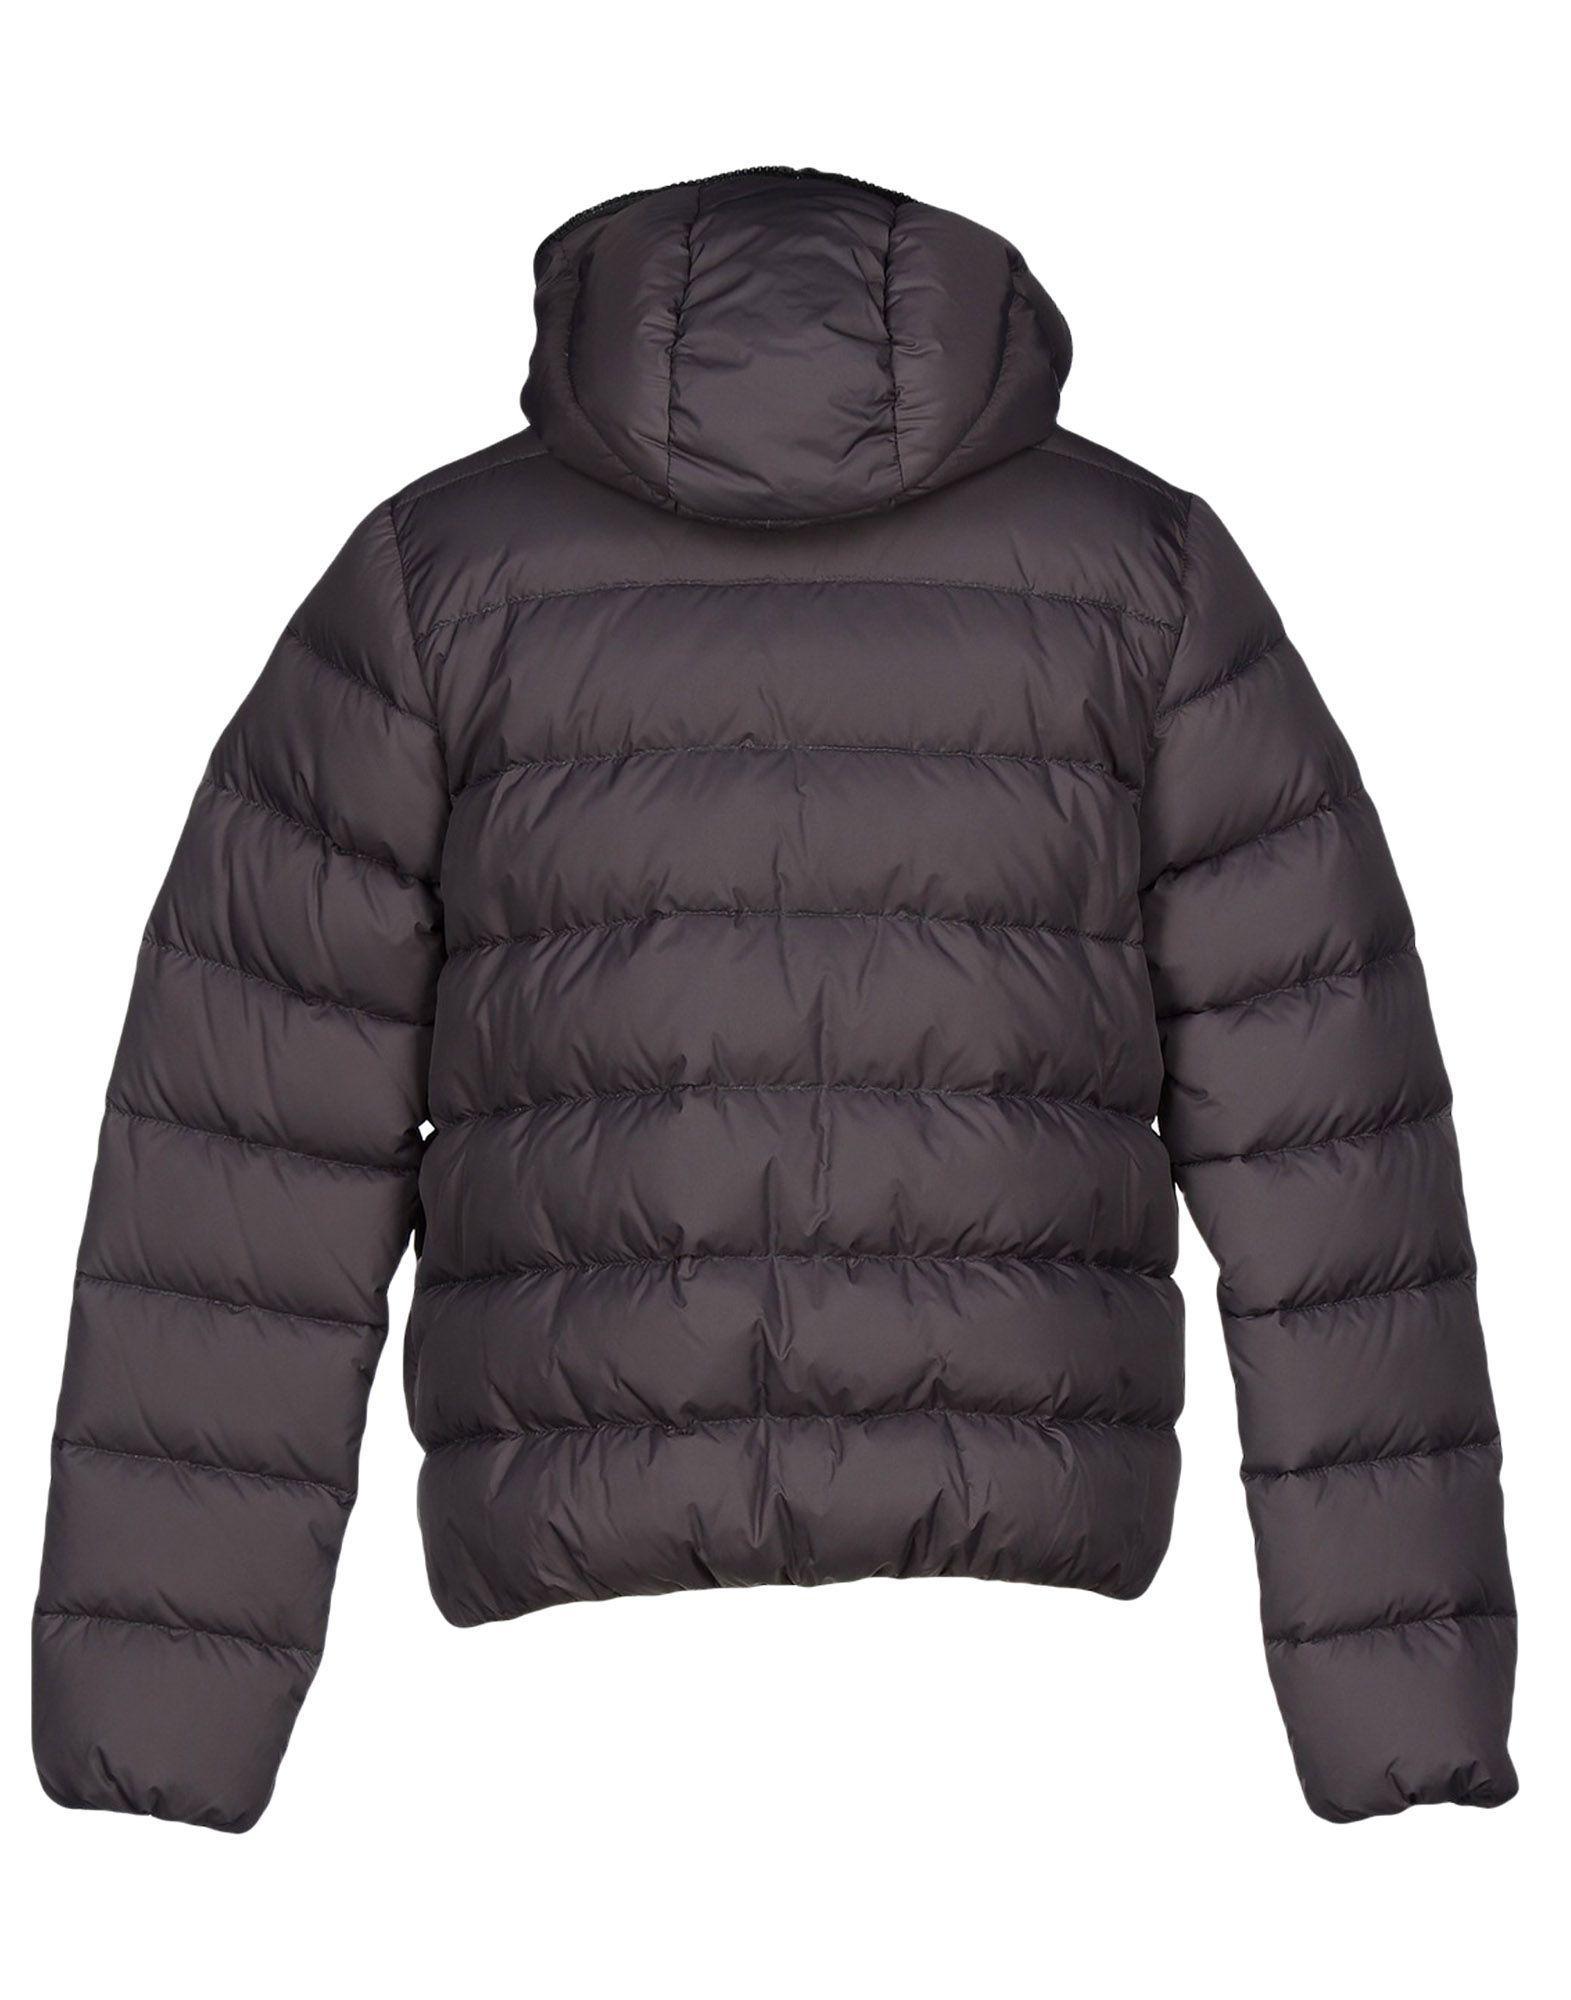 Duvetica Goose Down Jacket in Lead (Brown) for Men